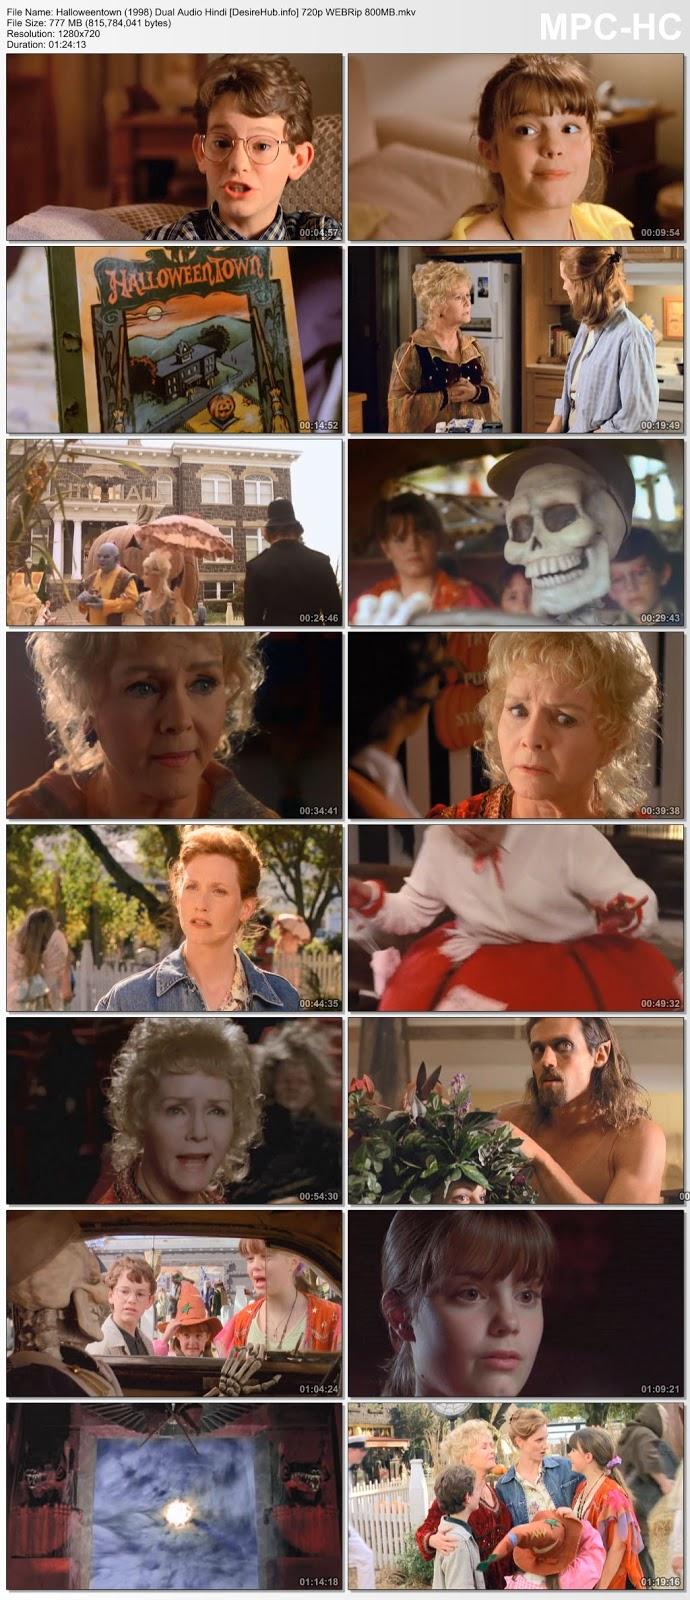 Halloweentown (1998) Dual Audio Hindi 720p WEBRip 800MB Desirehub